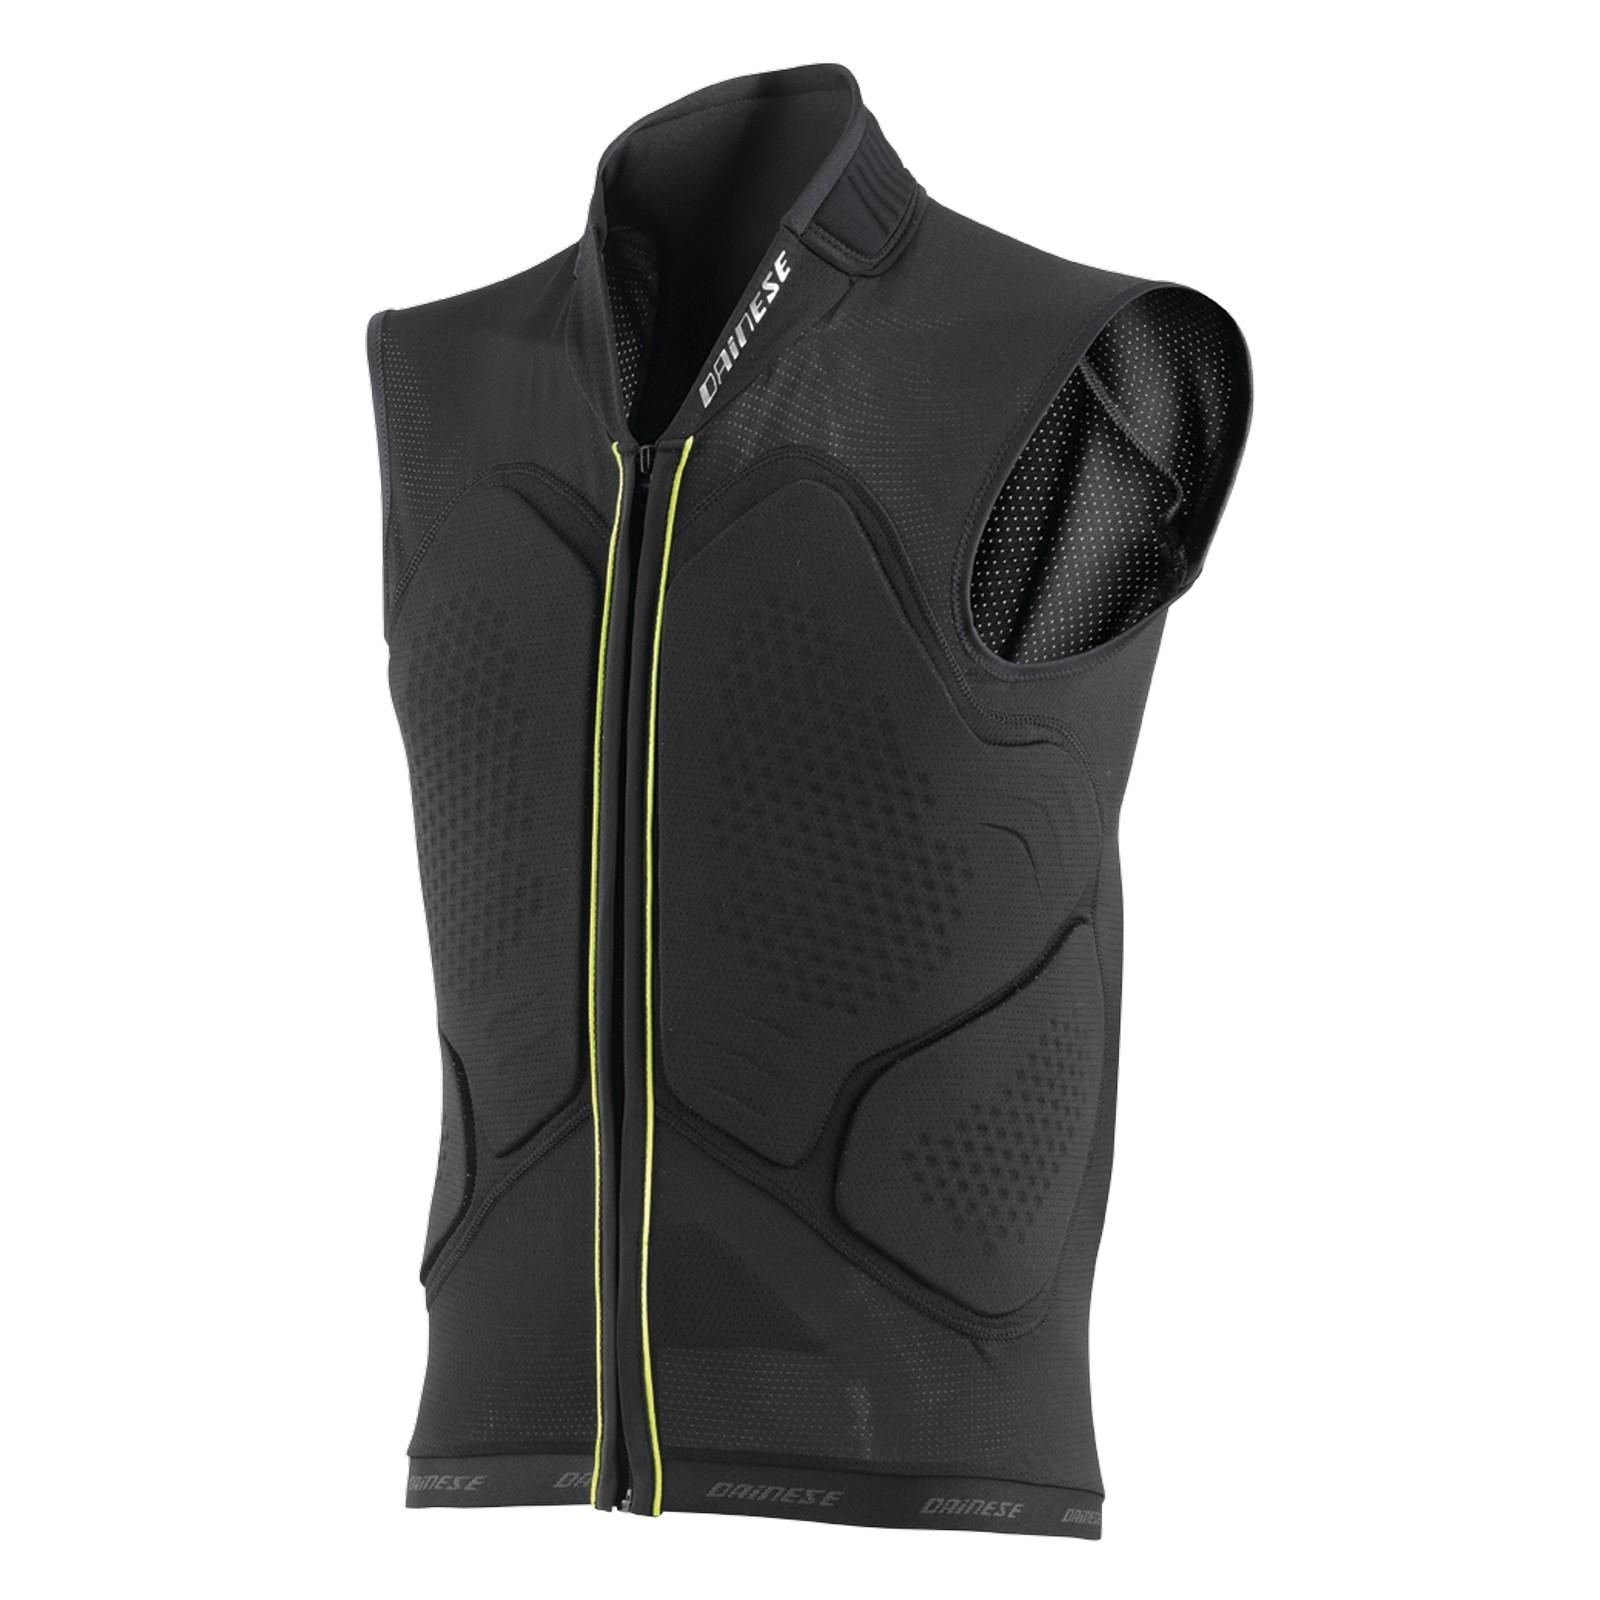 ski protektor skiprotektor protektorweste action vest pro von dainese ebay. Black Bedroom Furniture Sets. Home Design Ideas